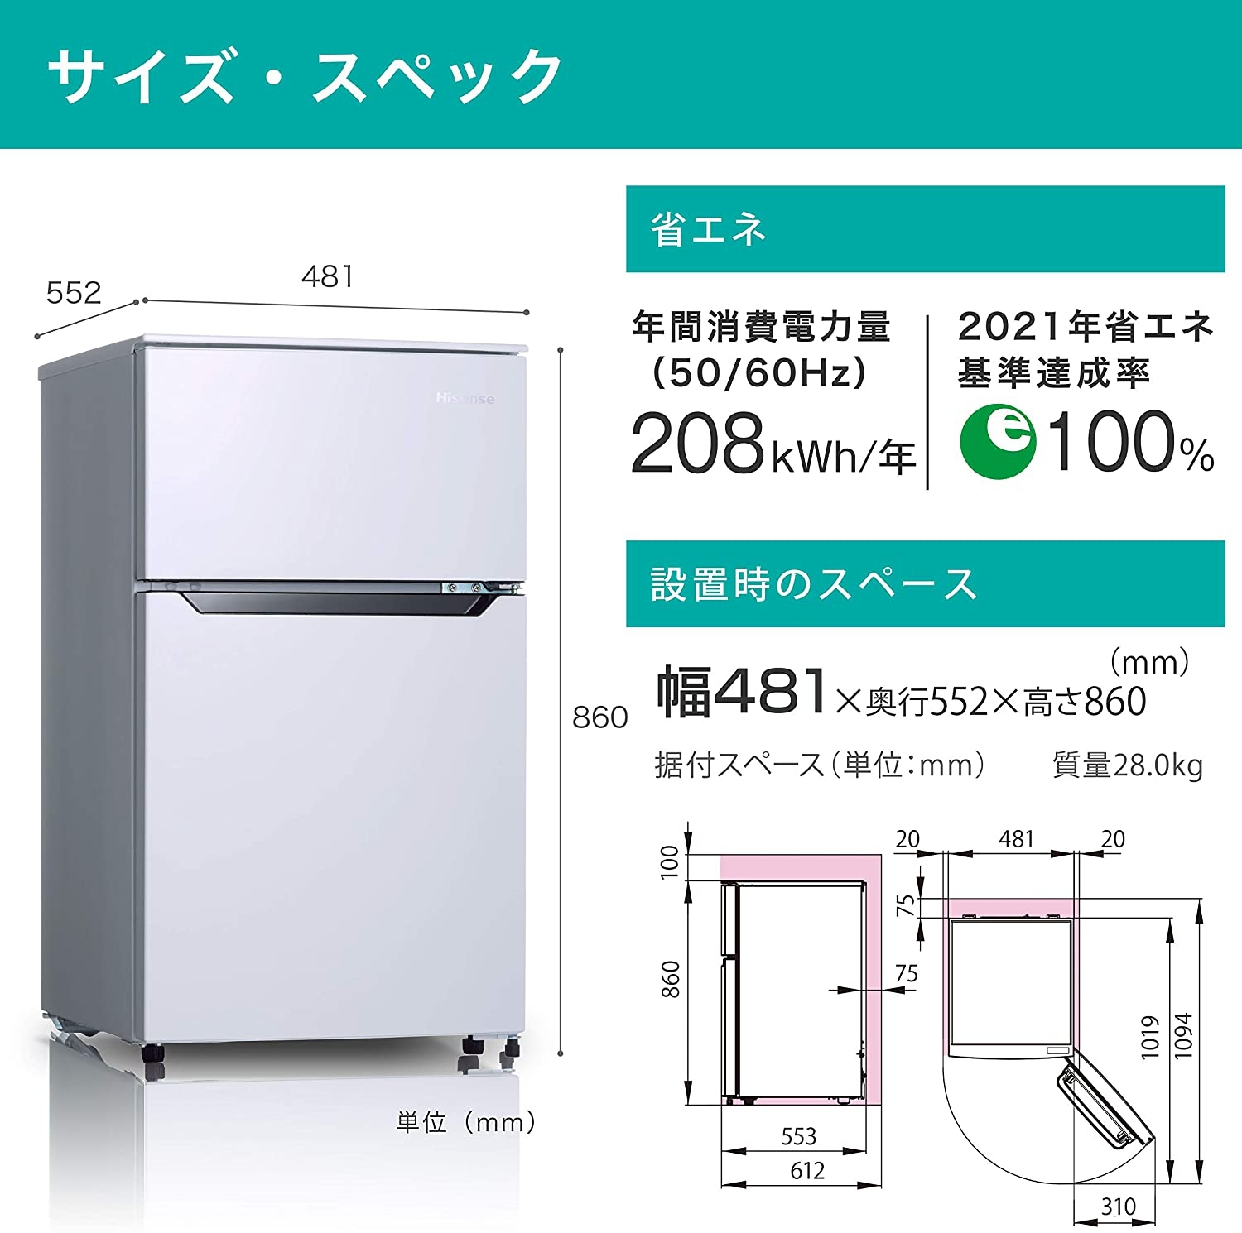 Hisense(ハイセンス)93L 冷凍冷蔵庫 HR-B95Aの商品画像7